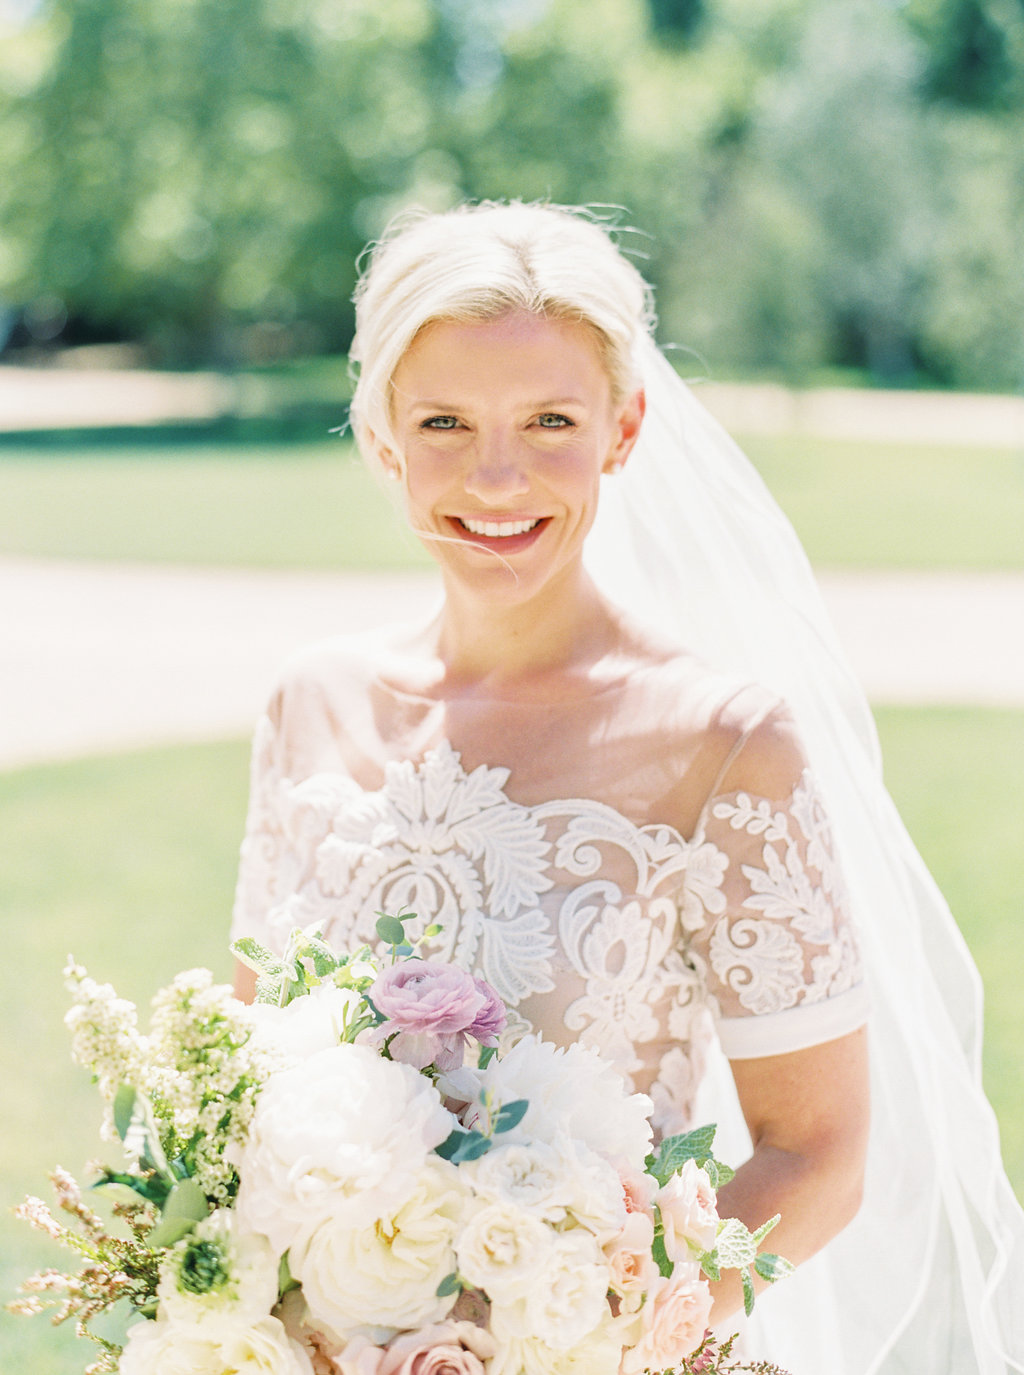 alegria-by-design-wedding-planner-planning-event-design-santa-barbara-day-of-coordinator-kestrel-park-santa-ynez-fields-castle-lavender-garden-mrs-box (11).jpg